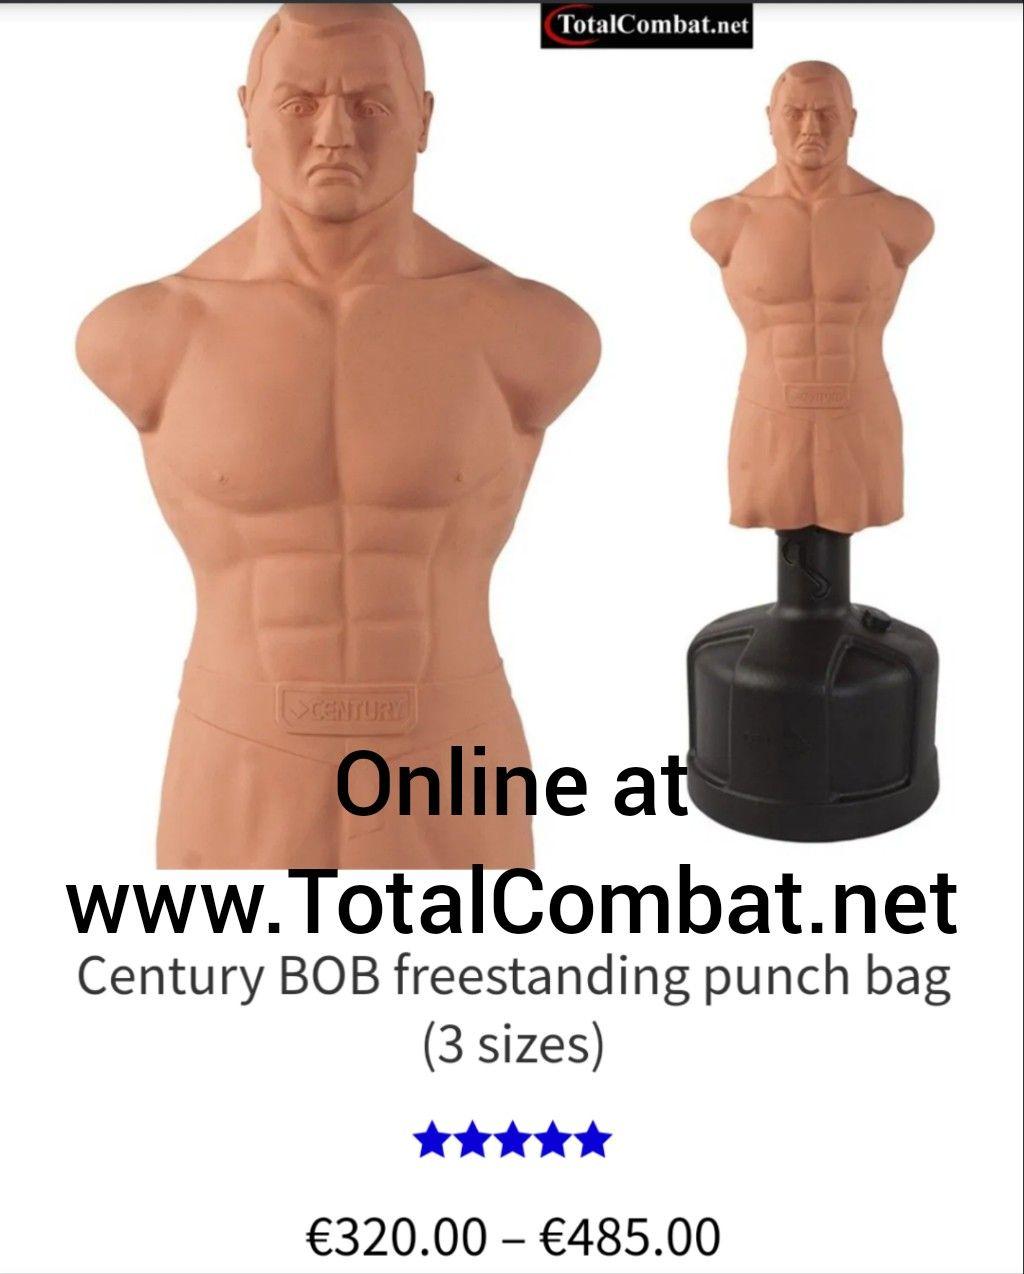 Century BOB Freestanding Punch Bag